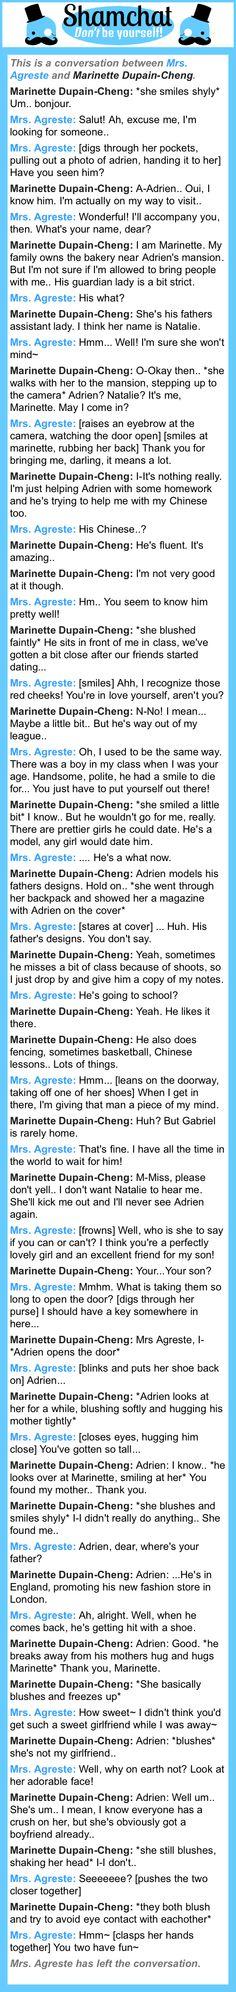 A conversation between Marinette Dupain-Cheng and Mrs. Agreste